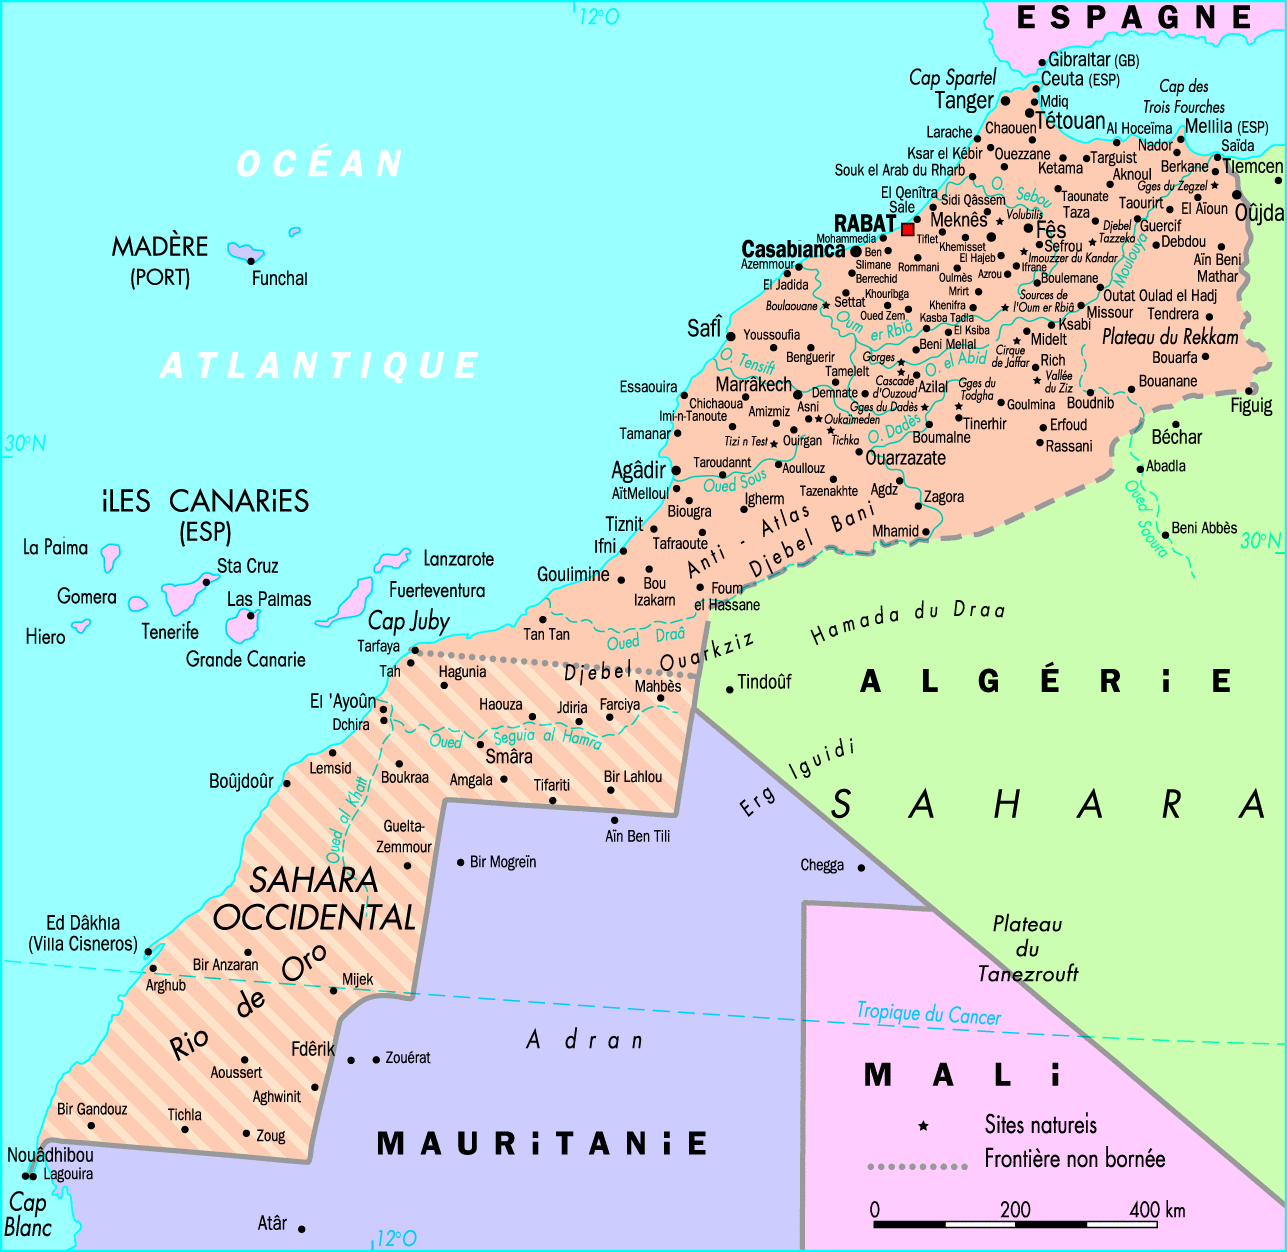 www.Mappi.net : Maps of countries : Morocco